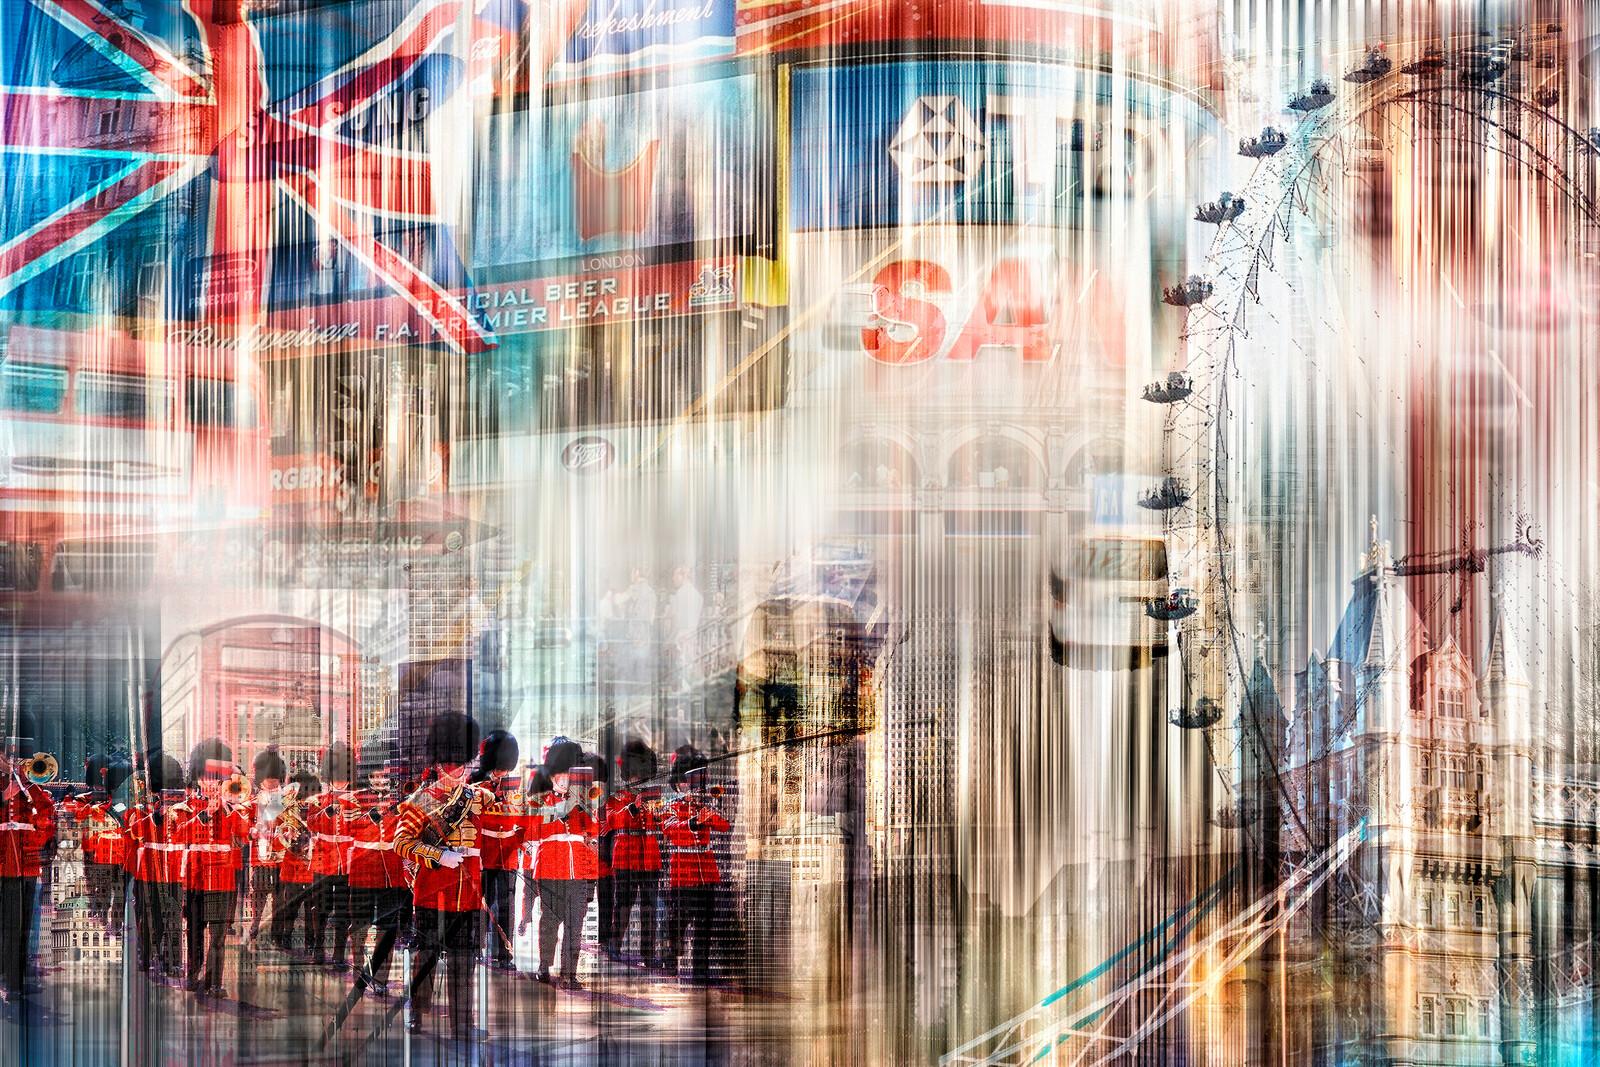 London - Annette Herdemann